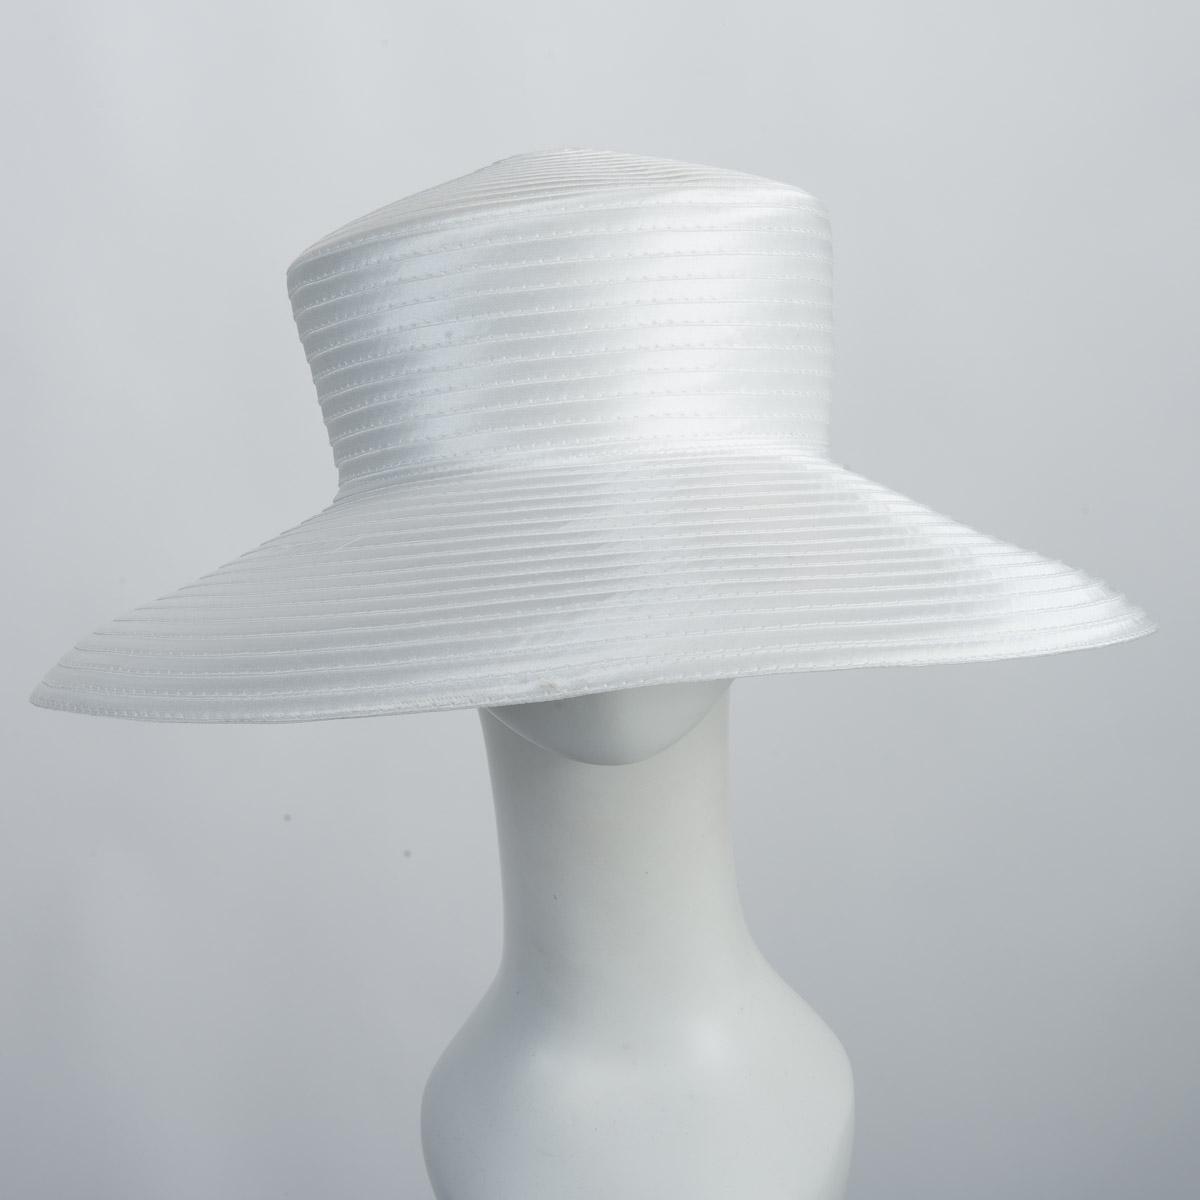 9e4005a1f732a White Madhatter Crown Downbrim Stain Hats-805105-WT- Sun Yorkos